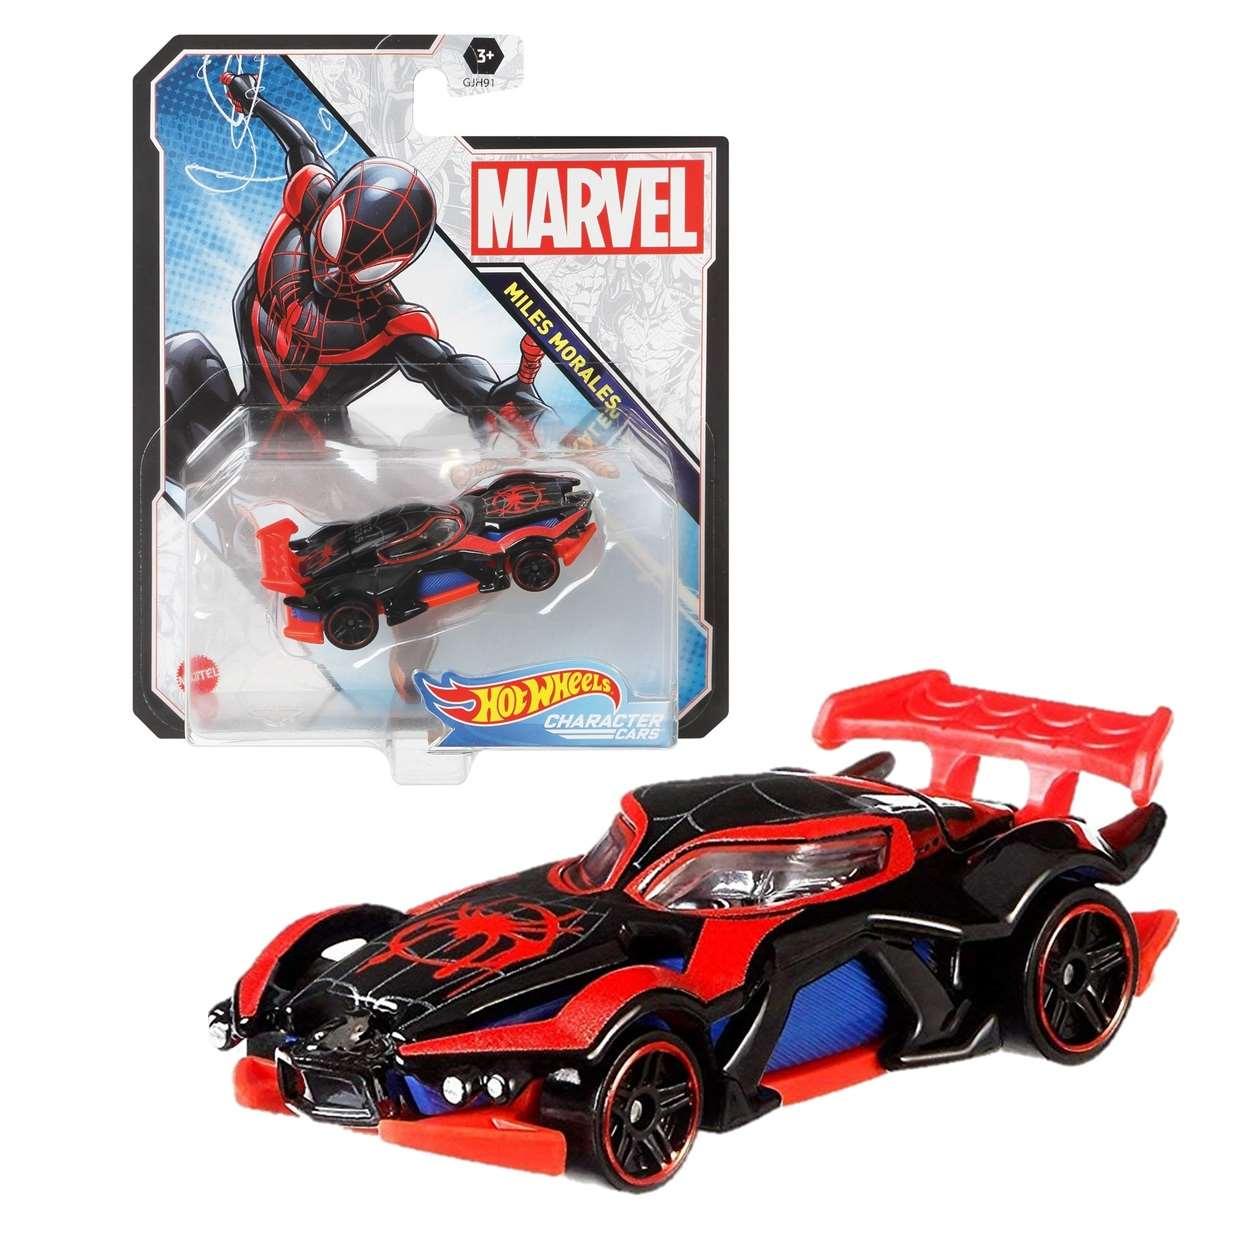 Miles Morales Gjh91 Hot Wheels Marvel Character Cars